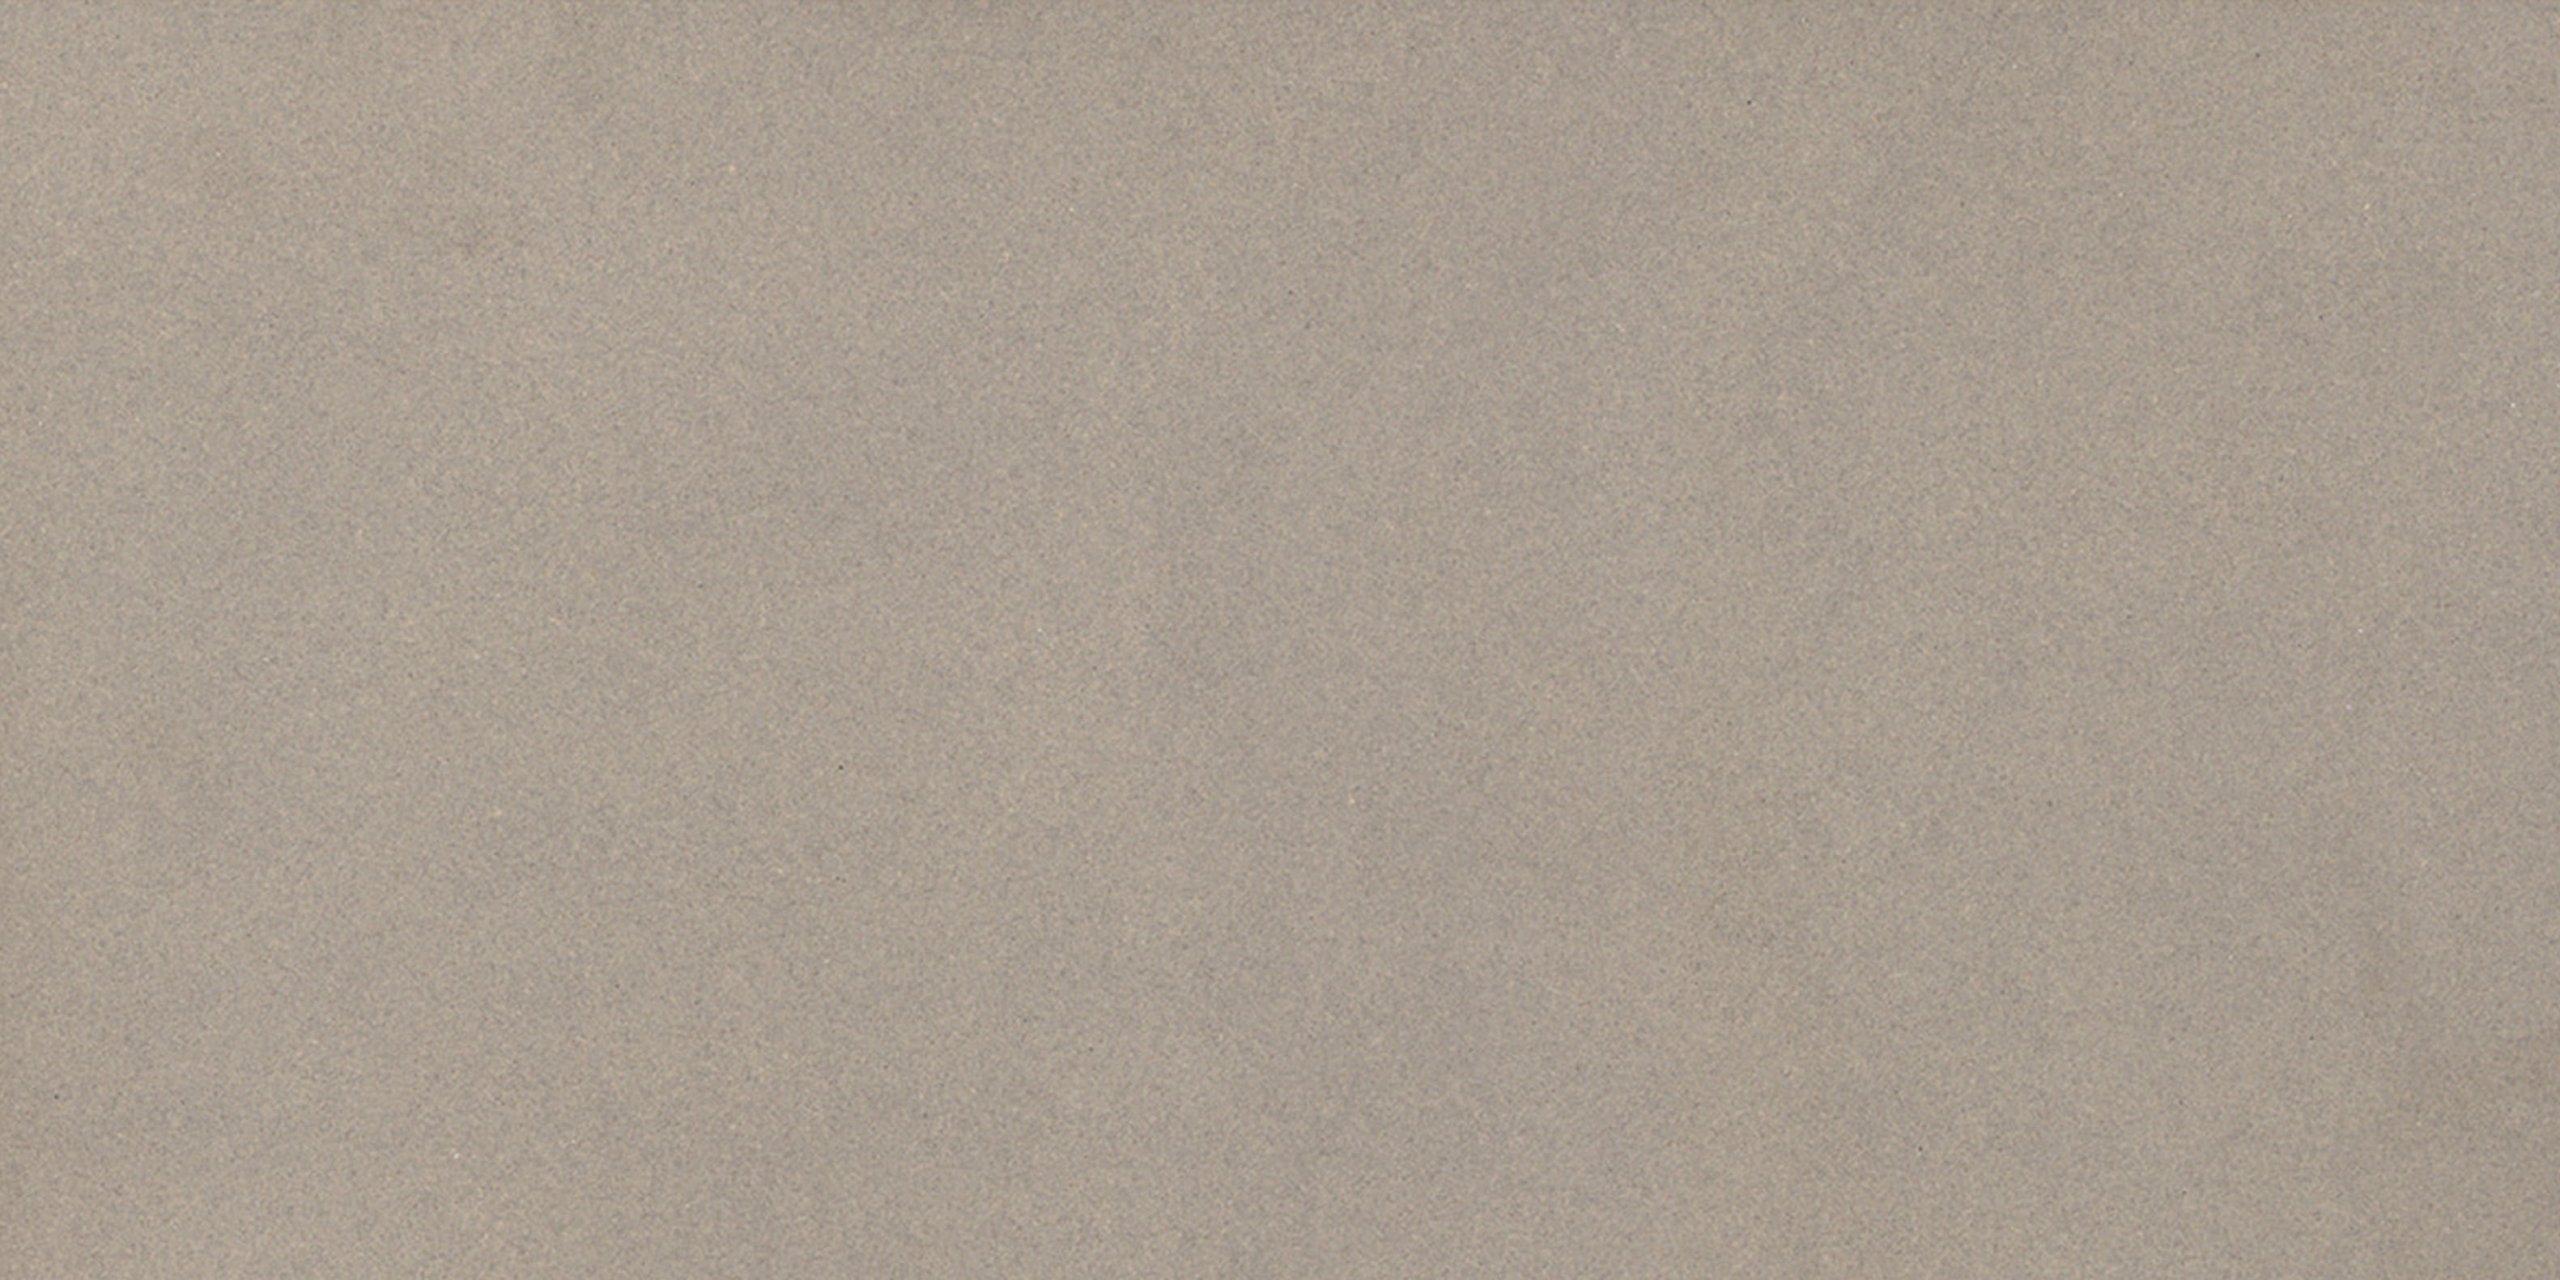 Fiandre USA USP1224054 Contemporary 12'' x 24'' New Marmi Taupe Gray Polished Porcelain Tile (8 Pack), Beige by Fiandre USA